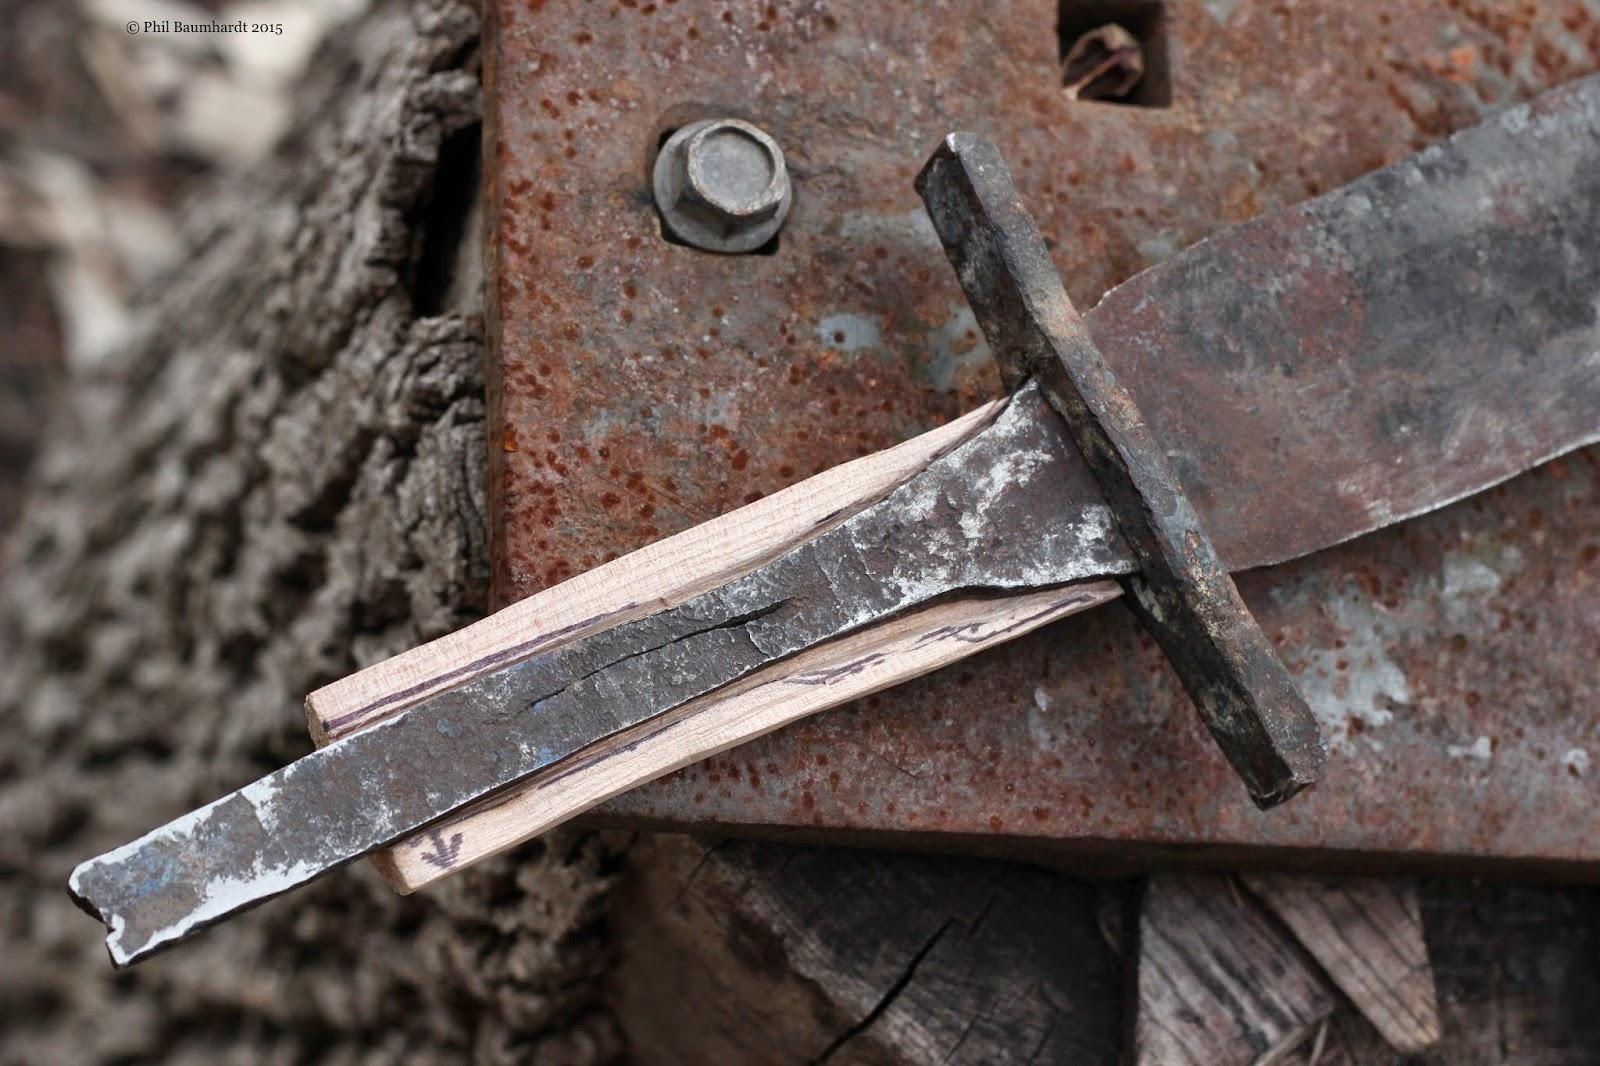 Backyard Blacksmith Forges Viking Sword From Vehicle Parts